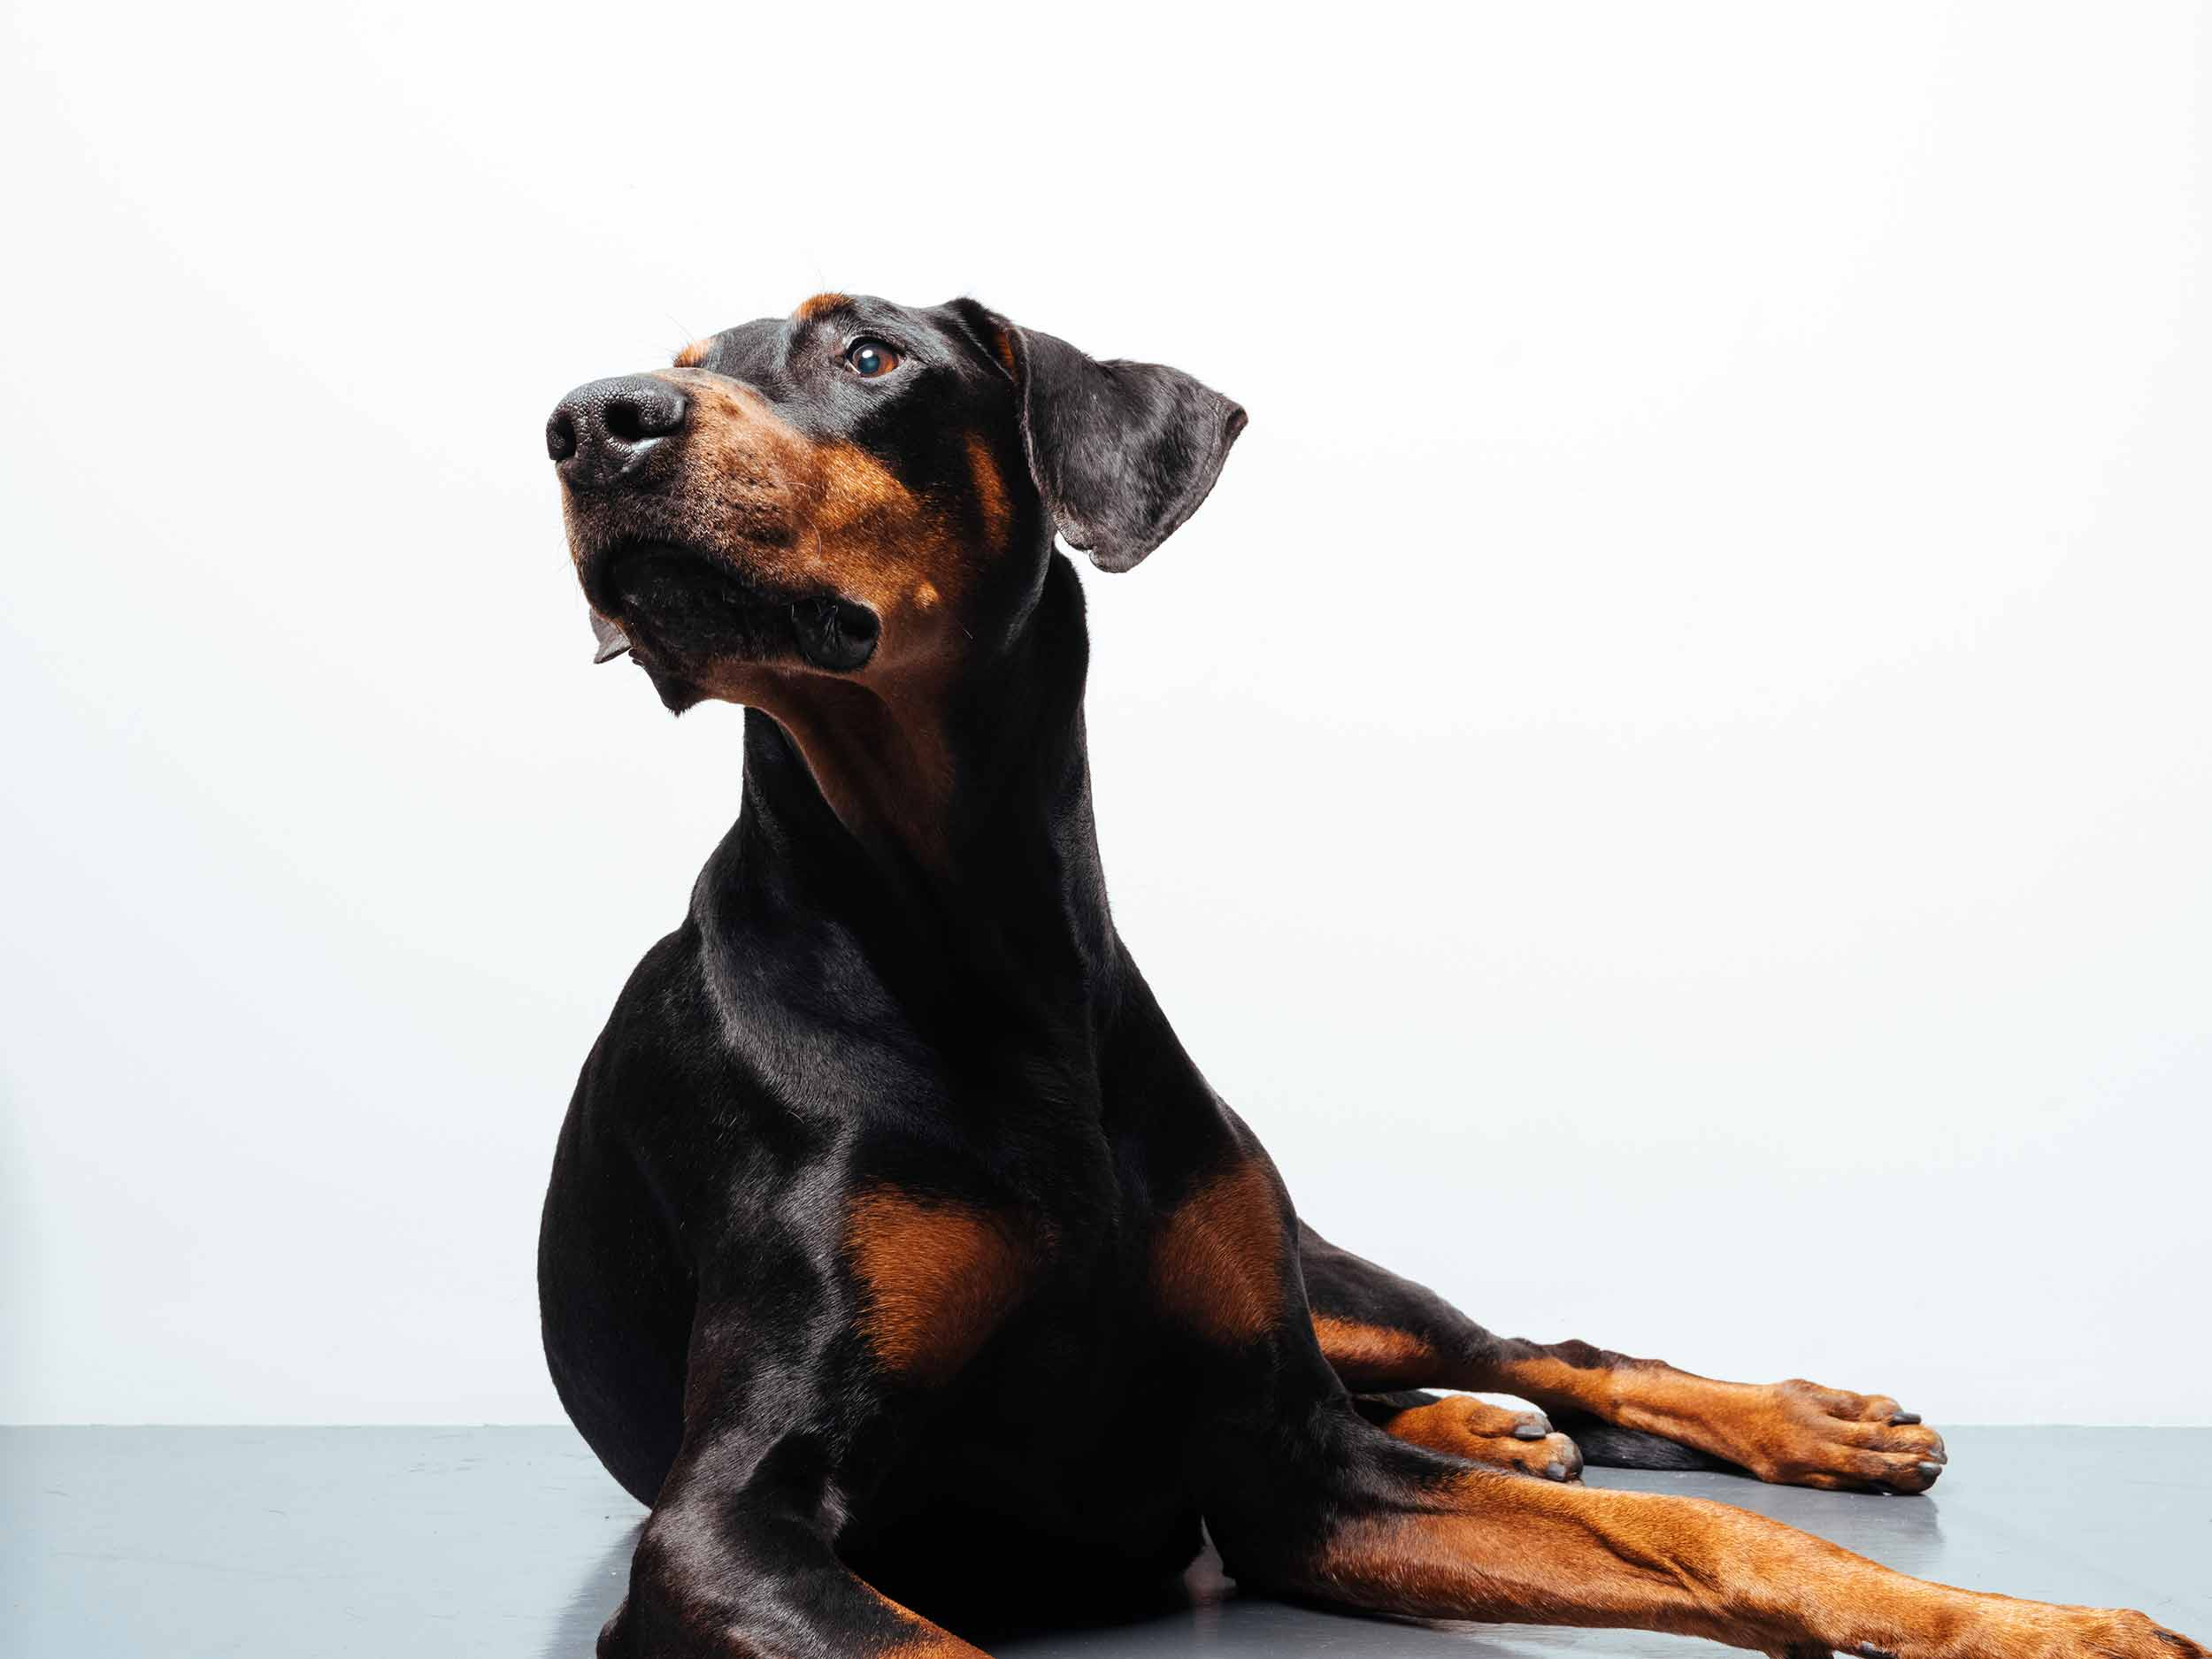 12.01---Dogs-Life_0012_06311.jpg